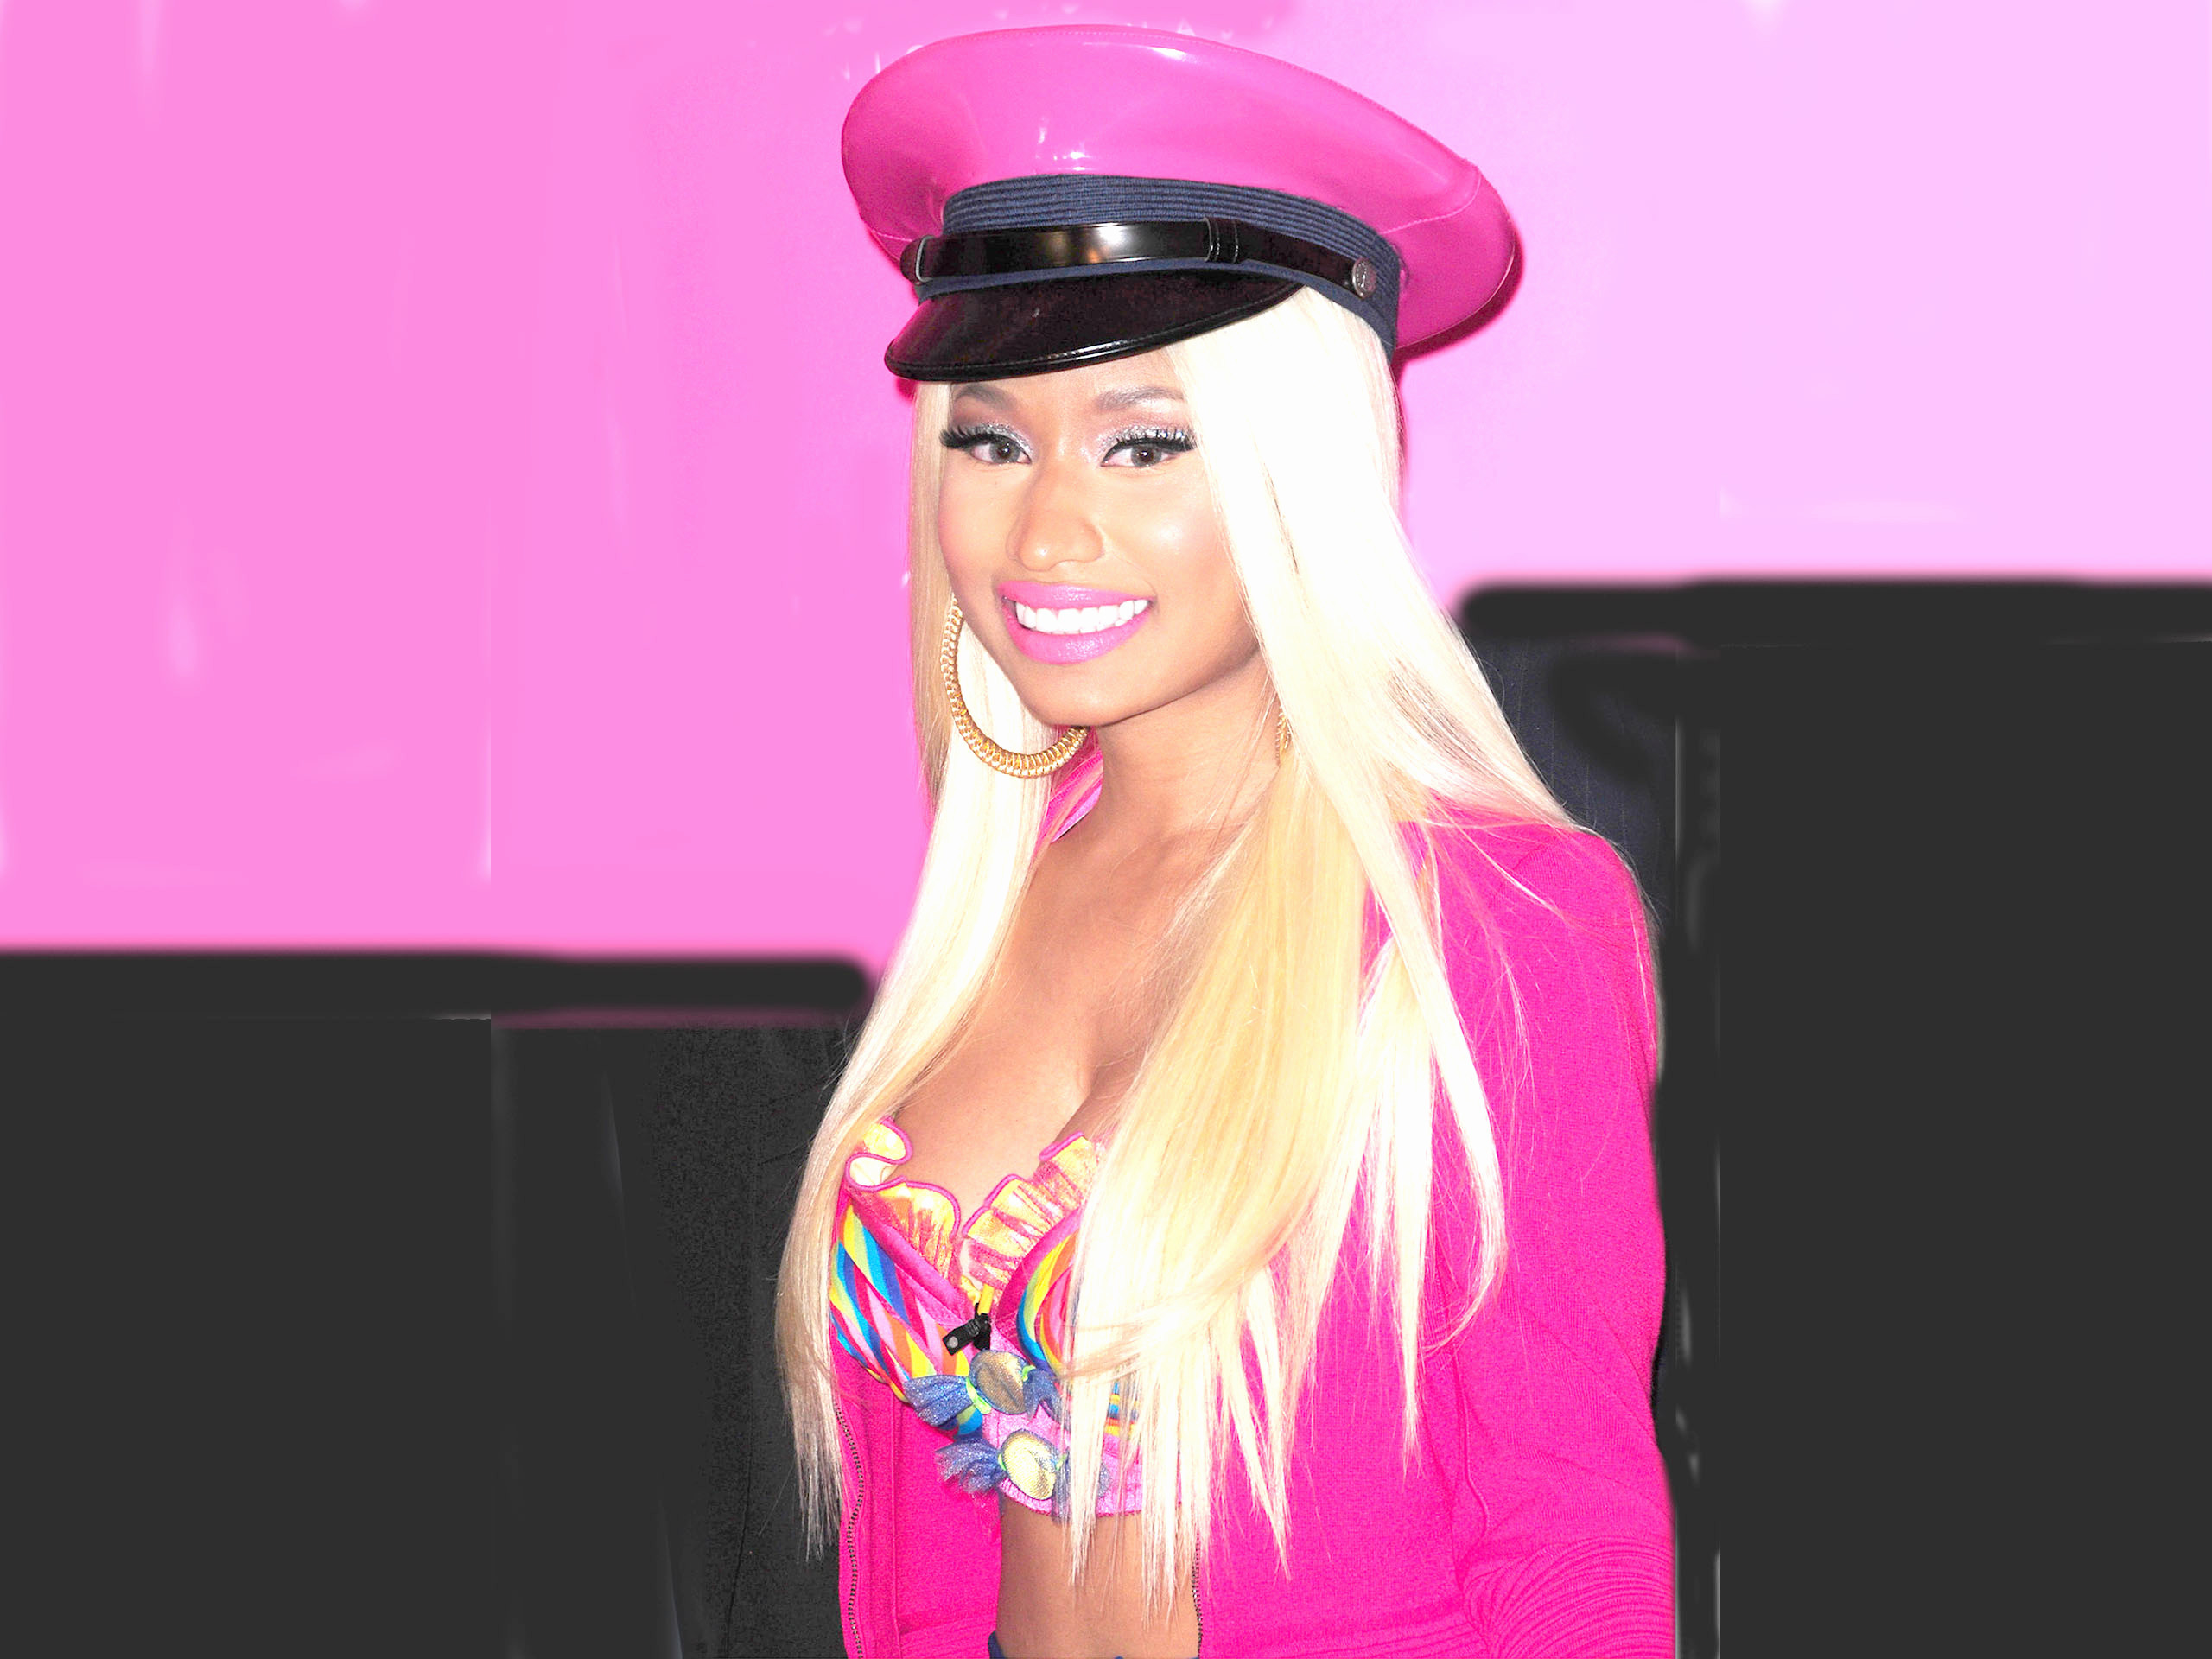 Res: 2560x1920, Nicki Minaj Photoshoot Inspirational 49 Nicki Minaj Wallpapers Hd Creative Nicki  Minaj Full Hd